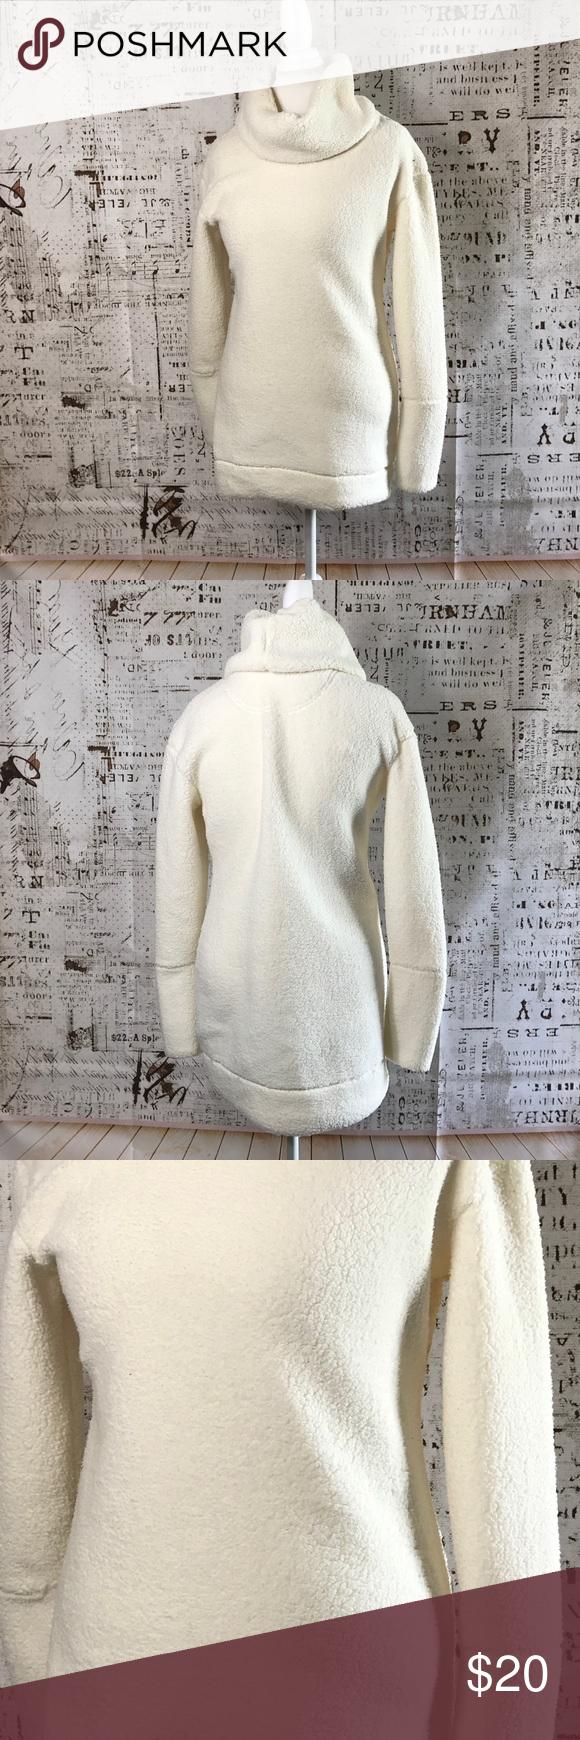 Beautiful Cotton Ball White Cowl-Neck Sweater | Cowl neck, Cozy ...